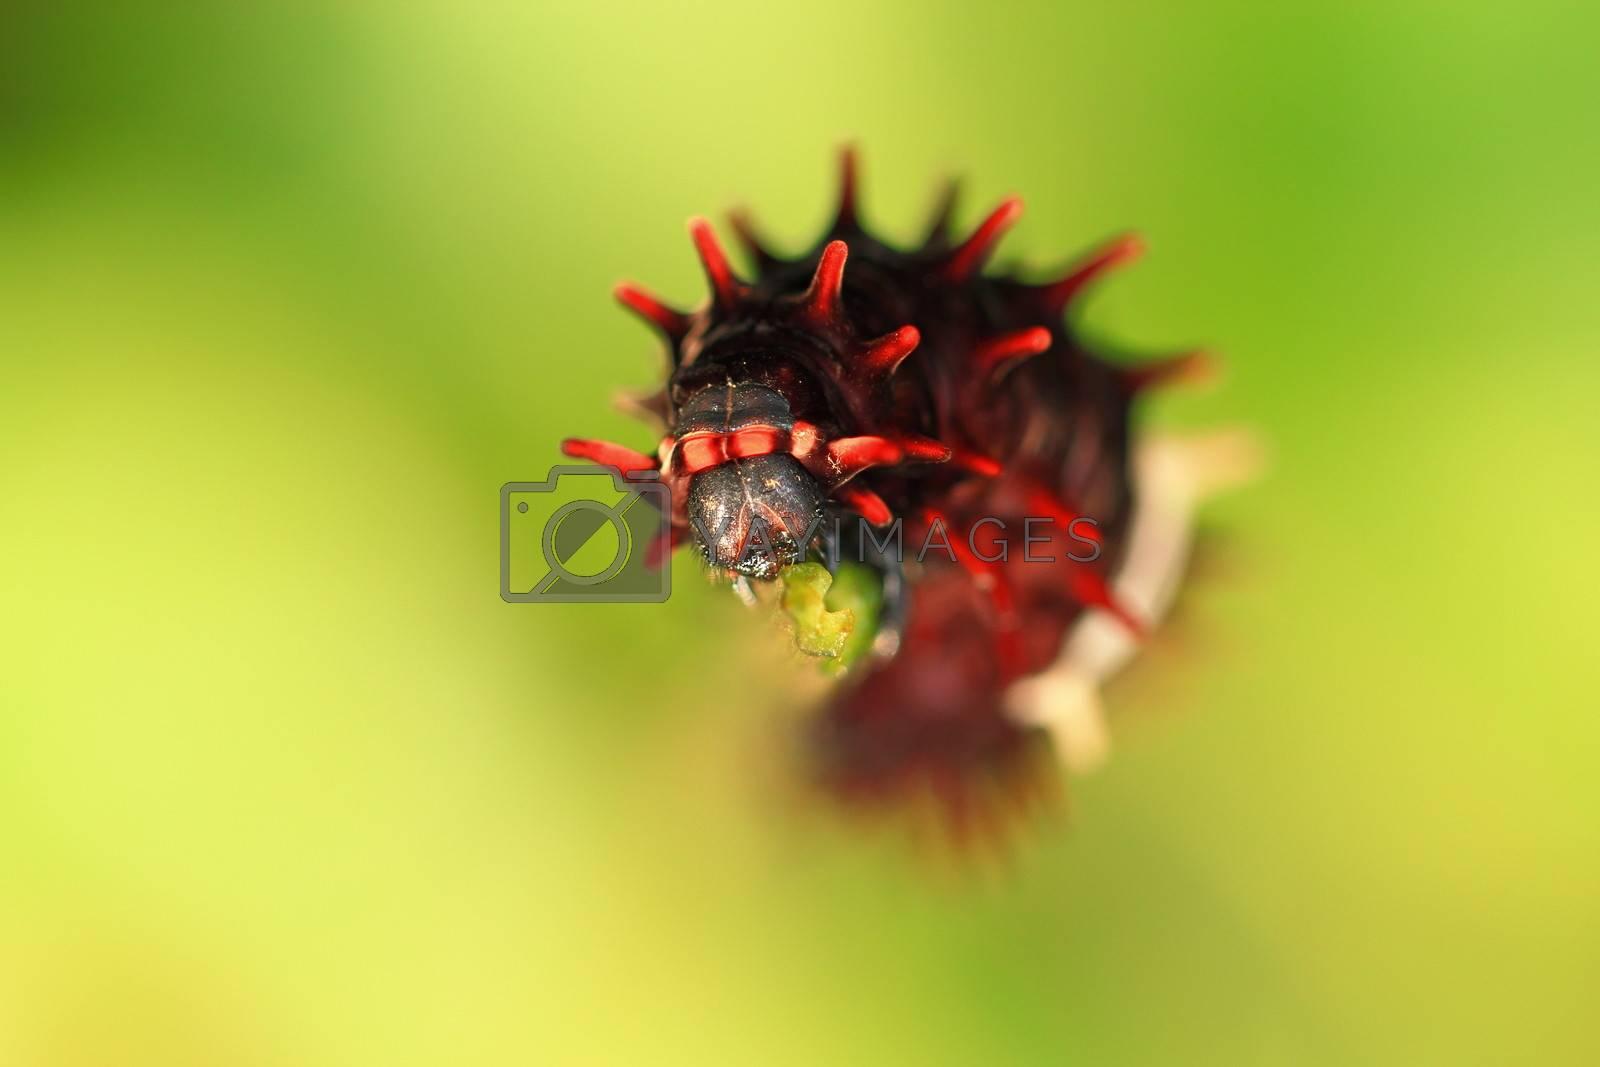 One step of caterpillar life